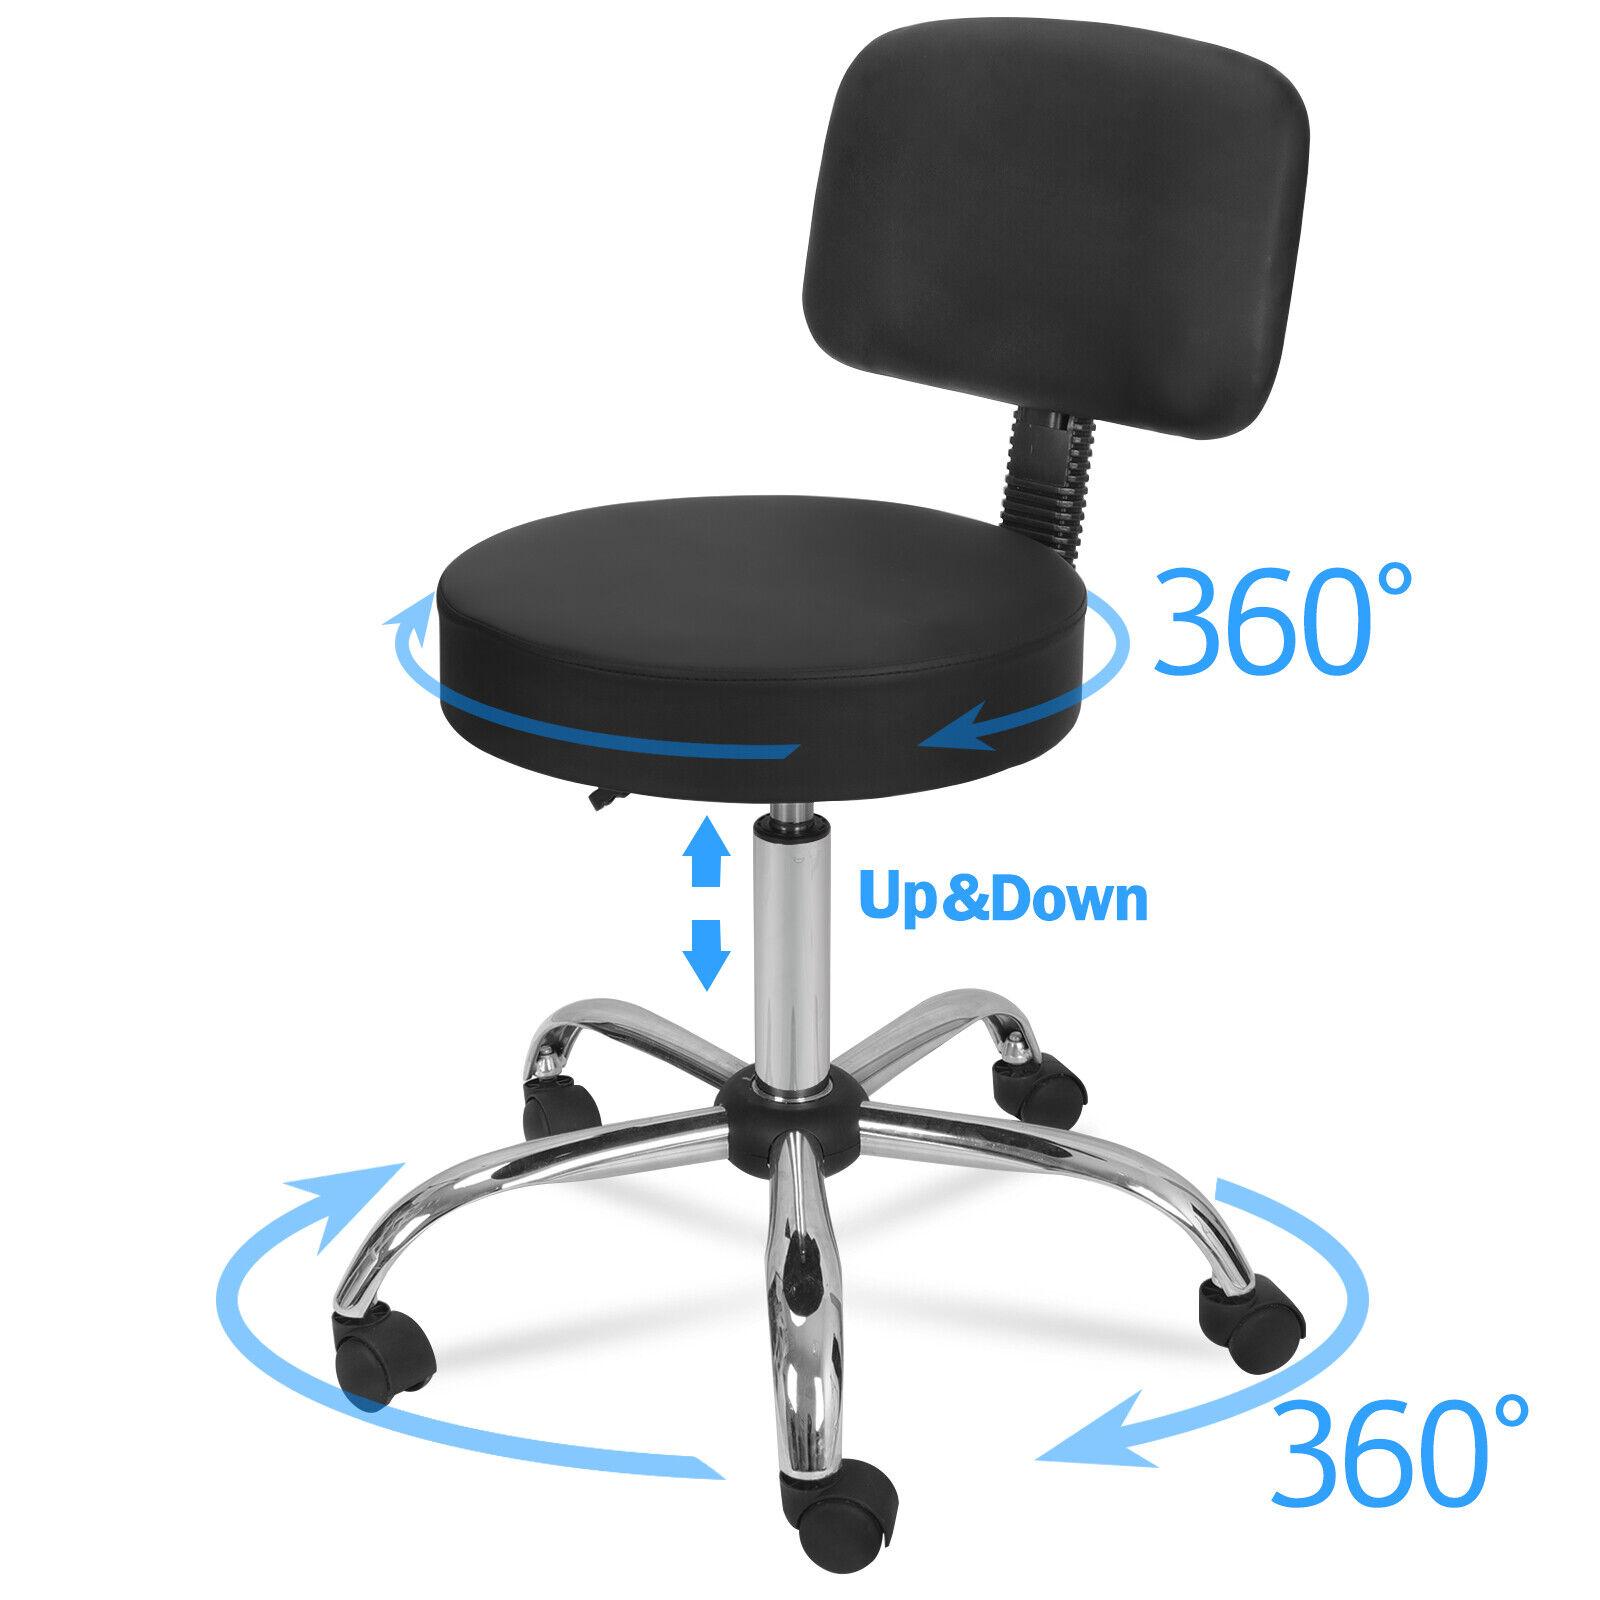 Adjustable Hydraulic Swivel Hair Salon Stool Chair Tattoo Spa Barber w/Backrest Health & Beauty